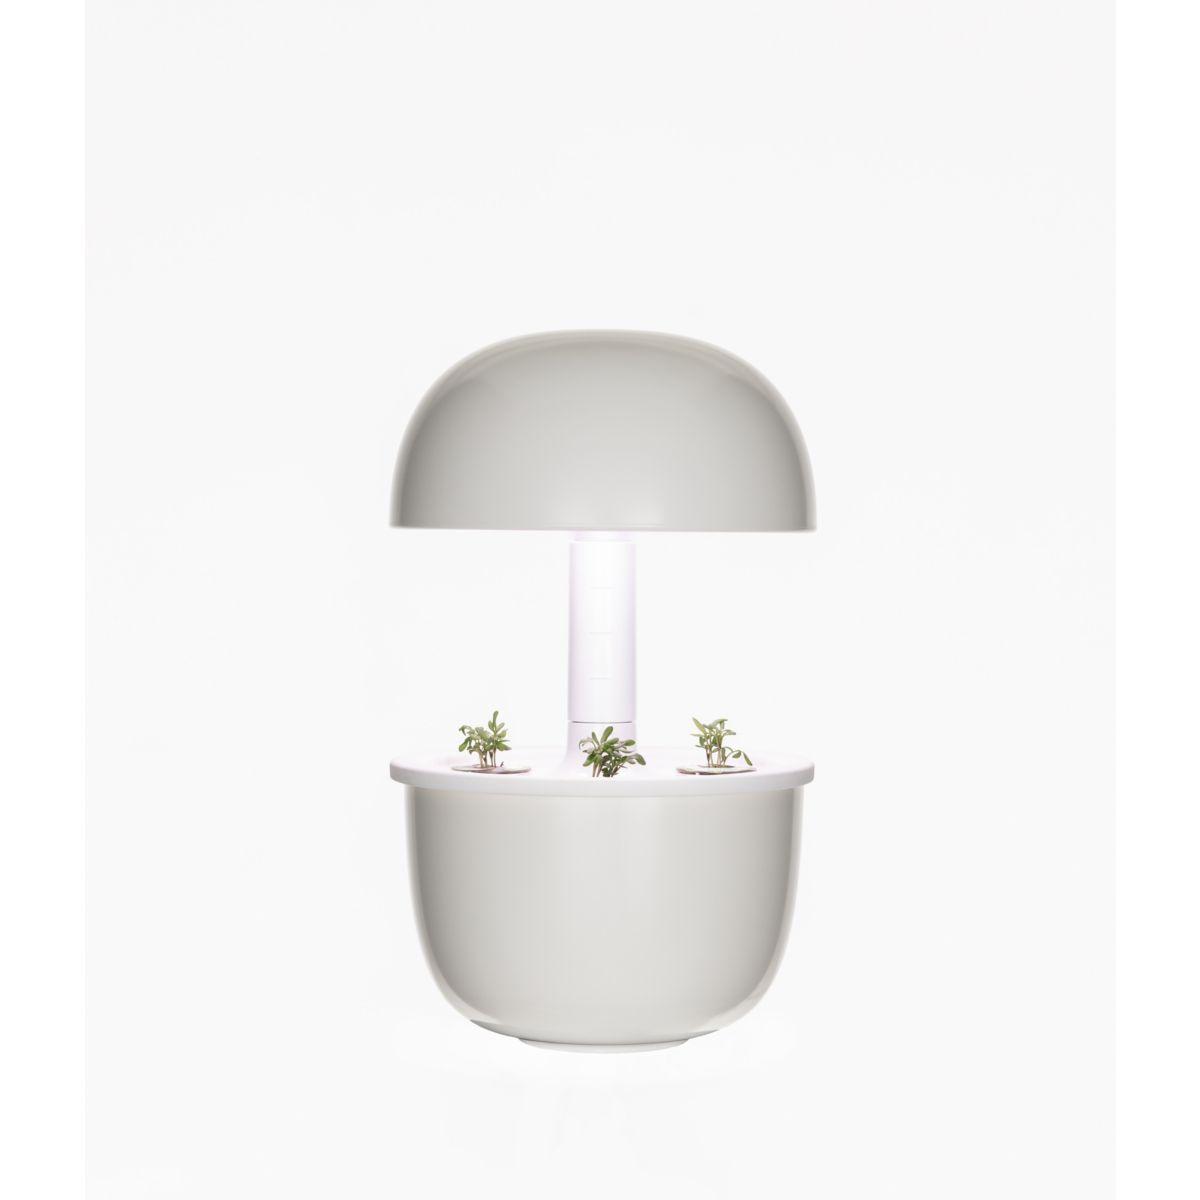 Jardin int . 3 smart garden blanc - livraison offerte : code liv (photo)